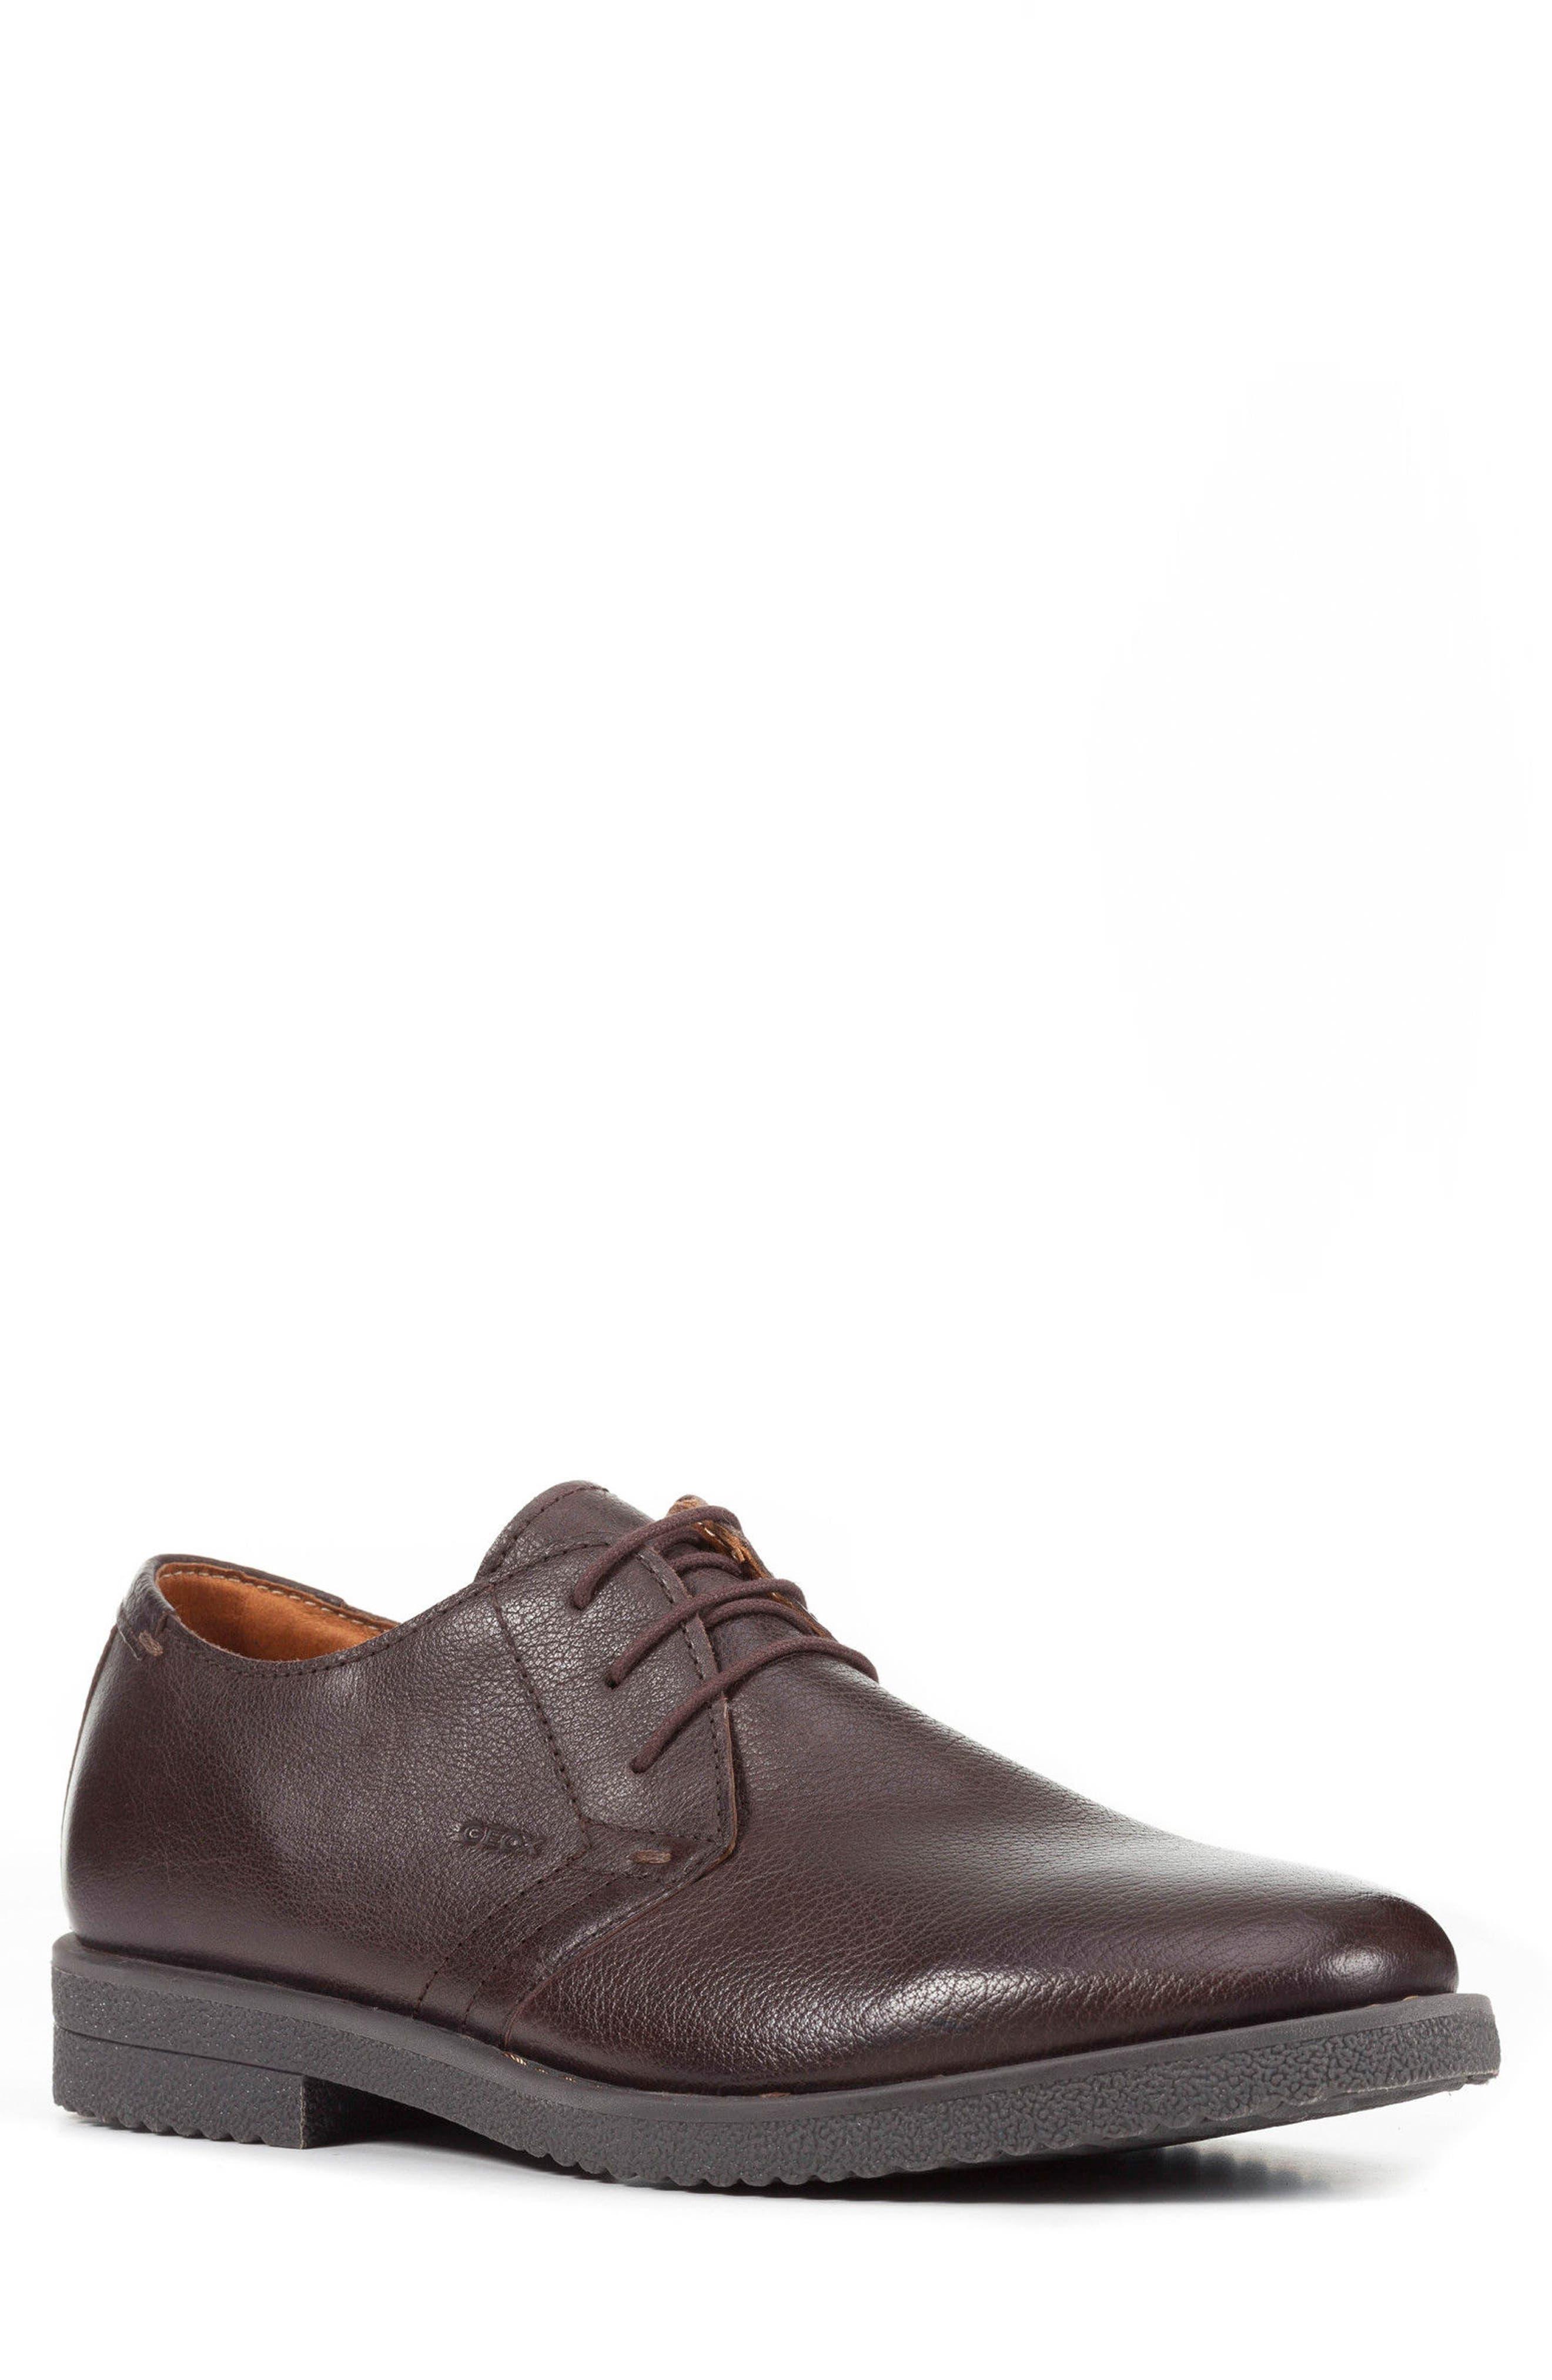 Main Image - Geox Brandled Plain Toe Derby (Men)